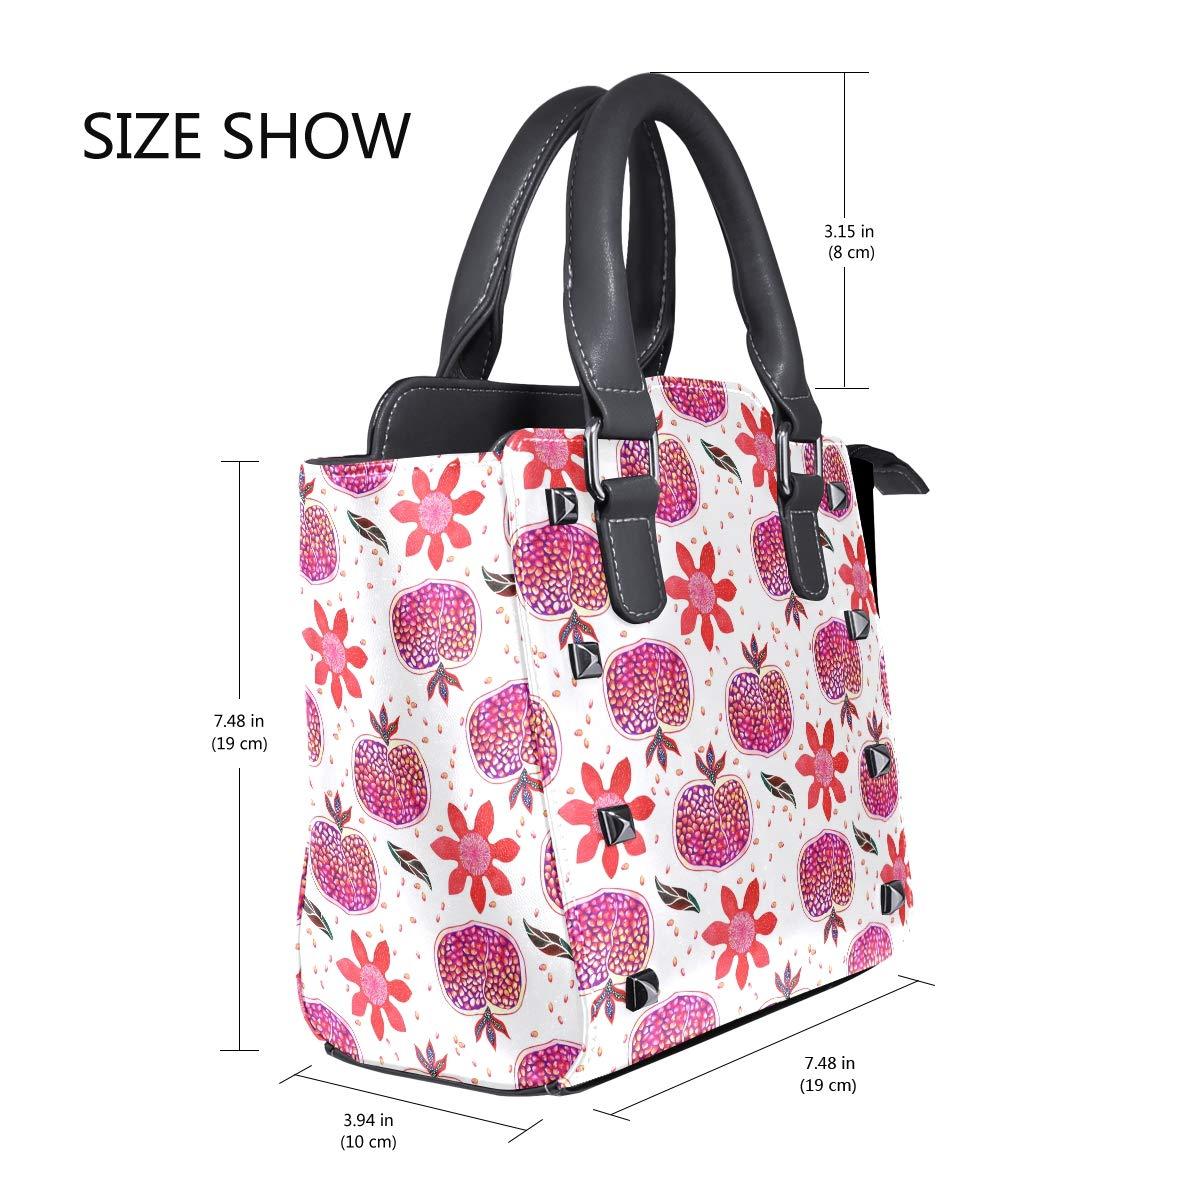 Womens Top Handle Satchel Handbag Watercolor Pomegranate Ladies PU Leather Shoulder Bag Crossbody Bag